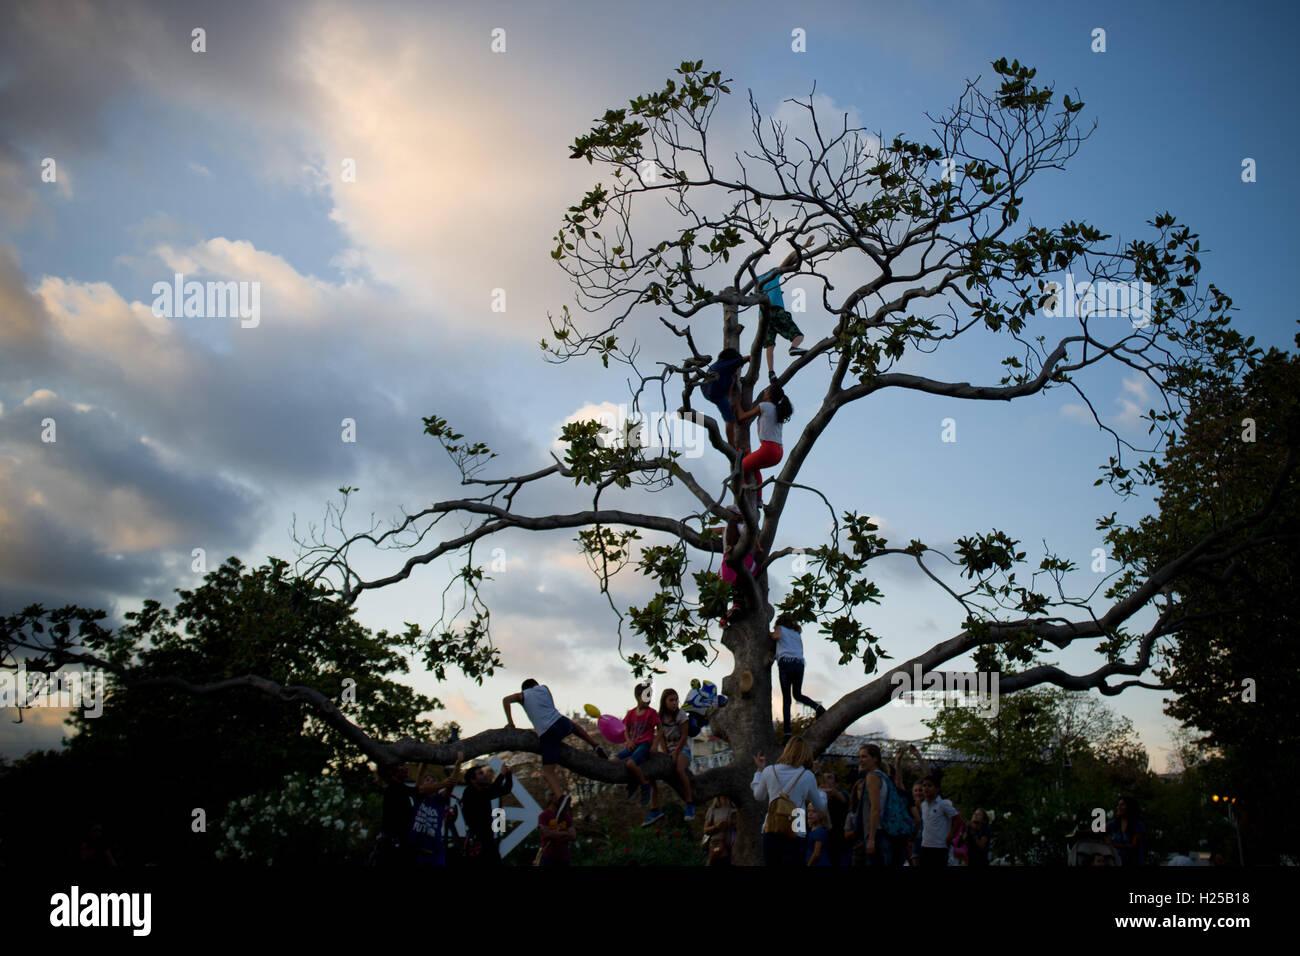 Barcelona, Catalonia, Spain. 24th Sep, 2016. Children enjoy climbing a tree at Ciutadella Park of Barcelona. © Jordi Boixareu/ZUMA Wire/Alamy Live News Stock Photo